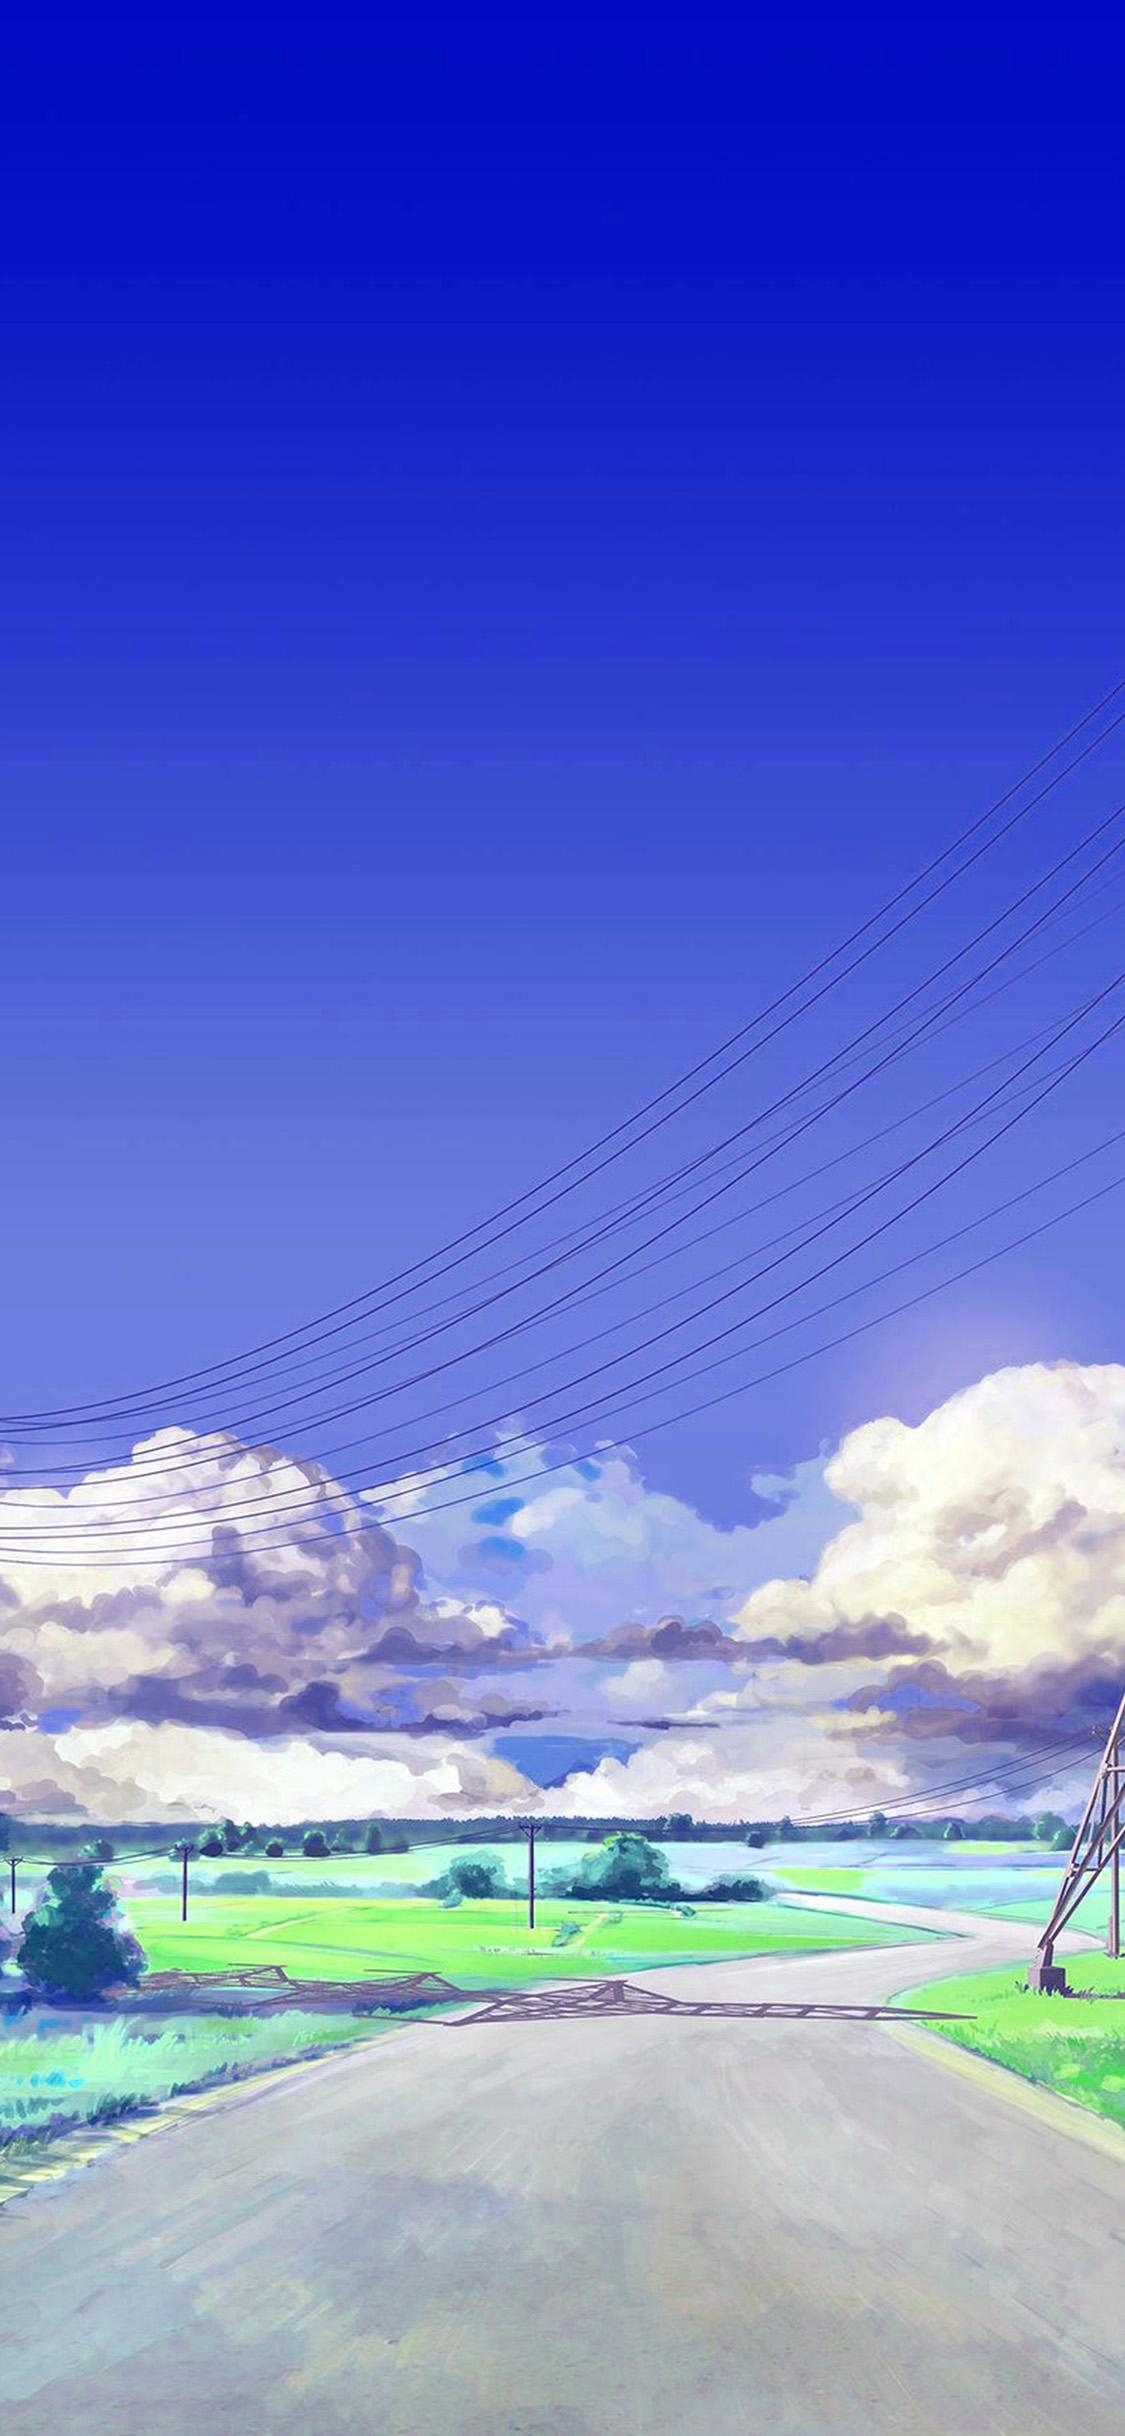 iPhonexpapers.com-Apple-iPhone-wallpaper-bc41-sunny-sky-arsenic-art-illustration